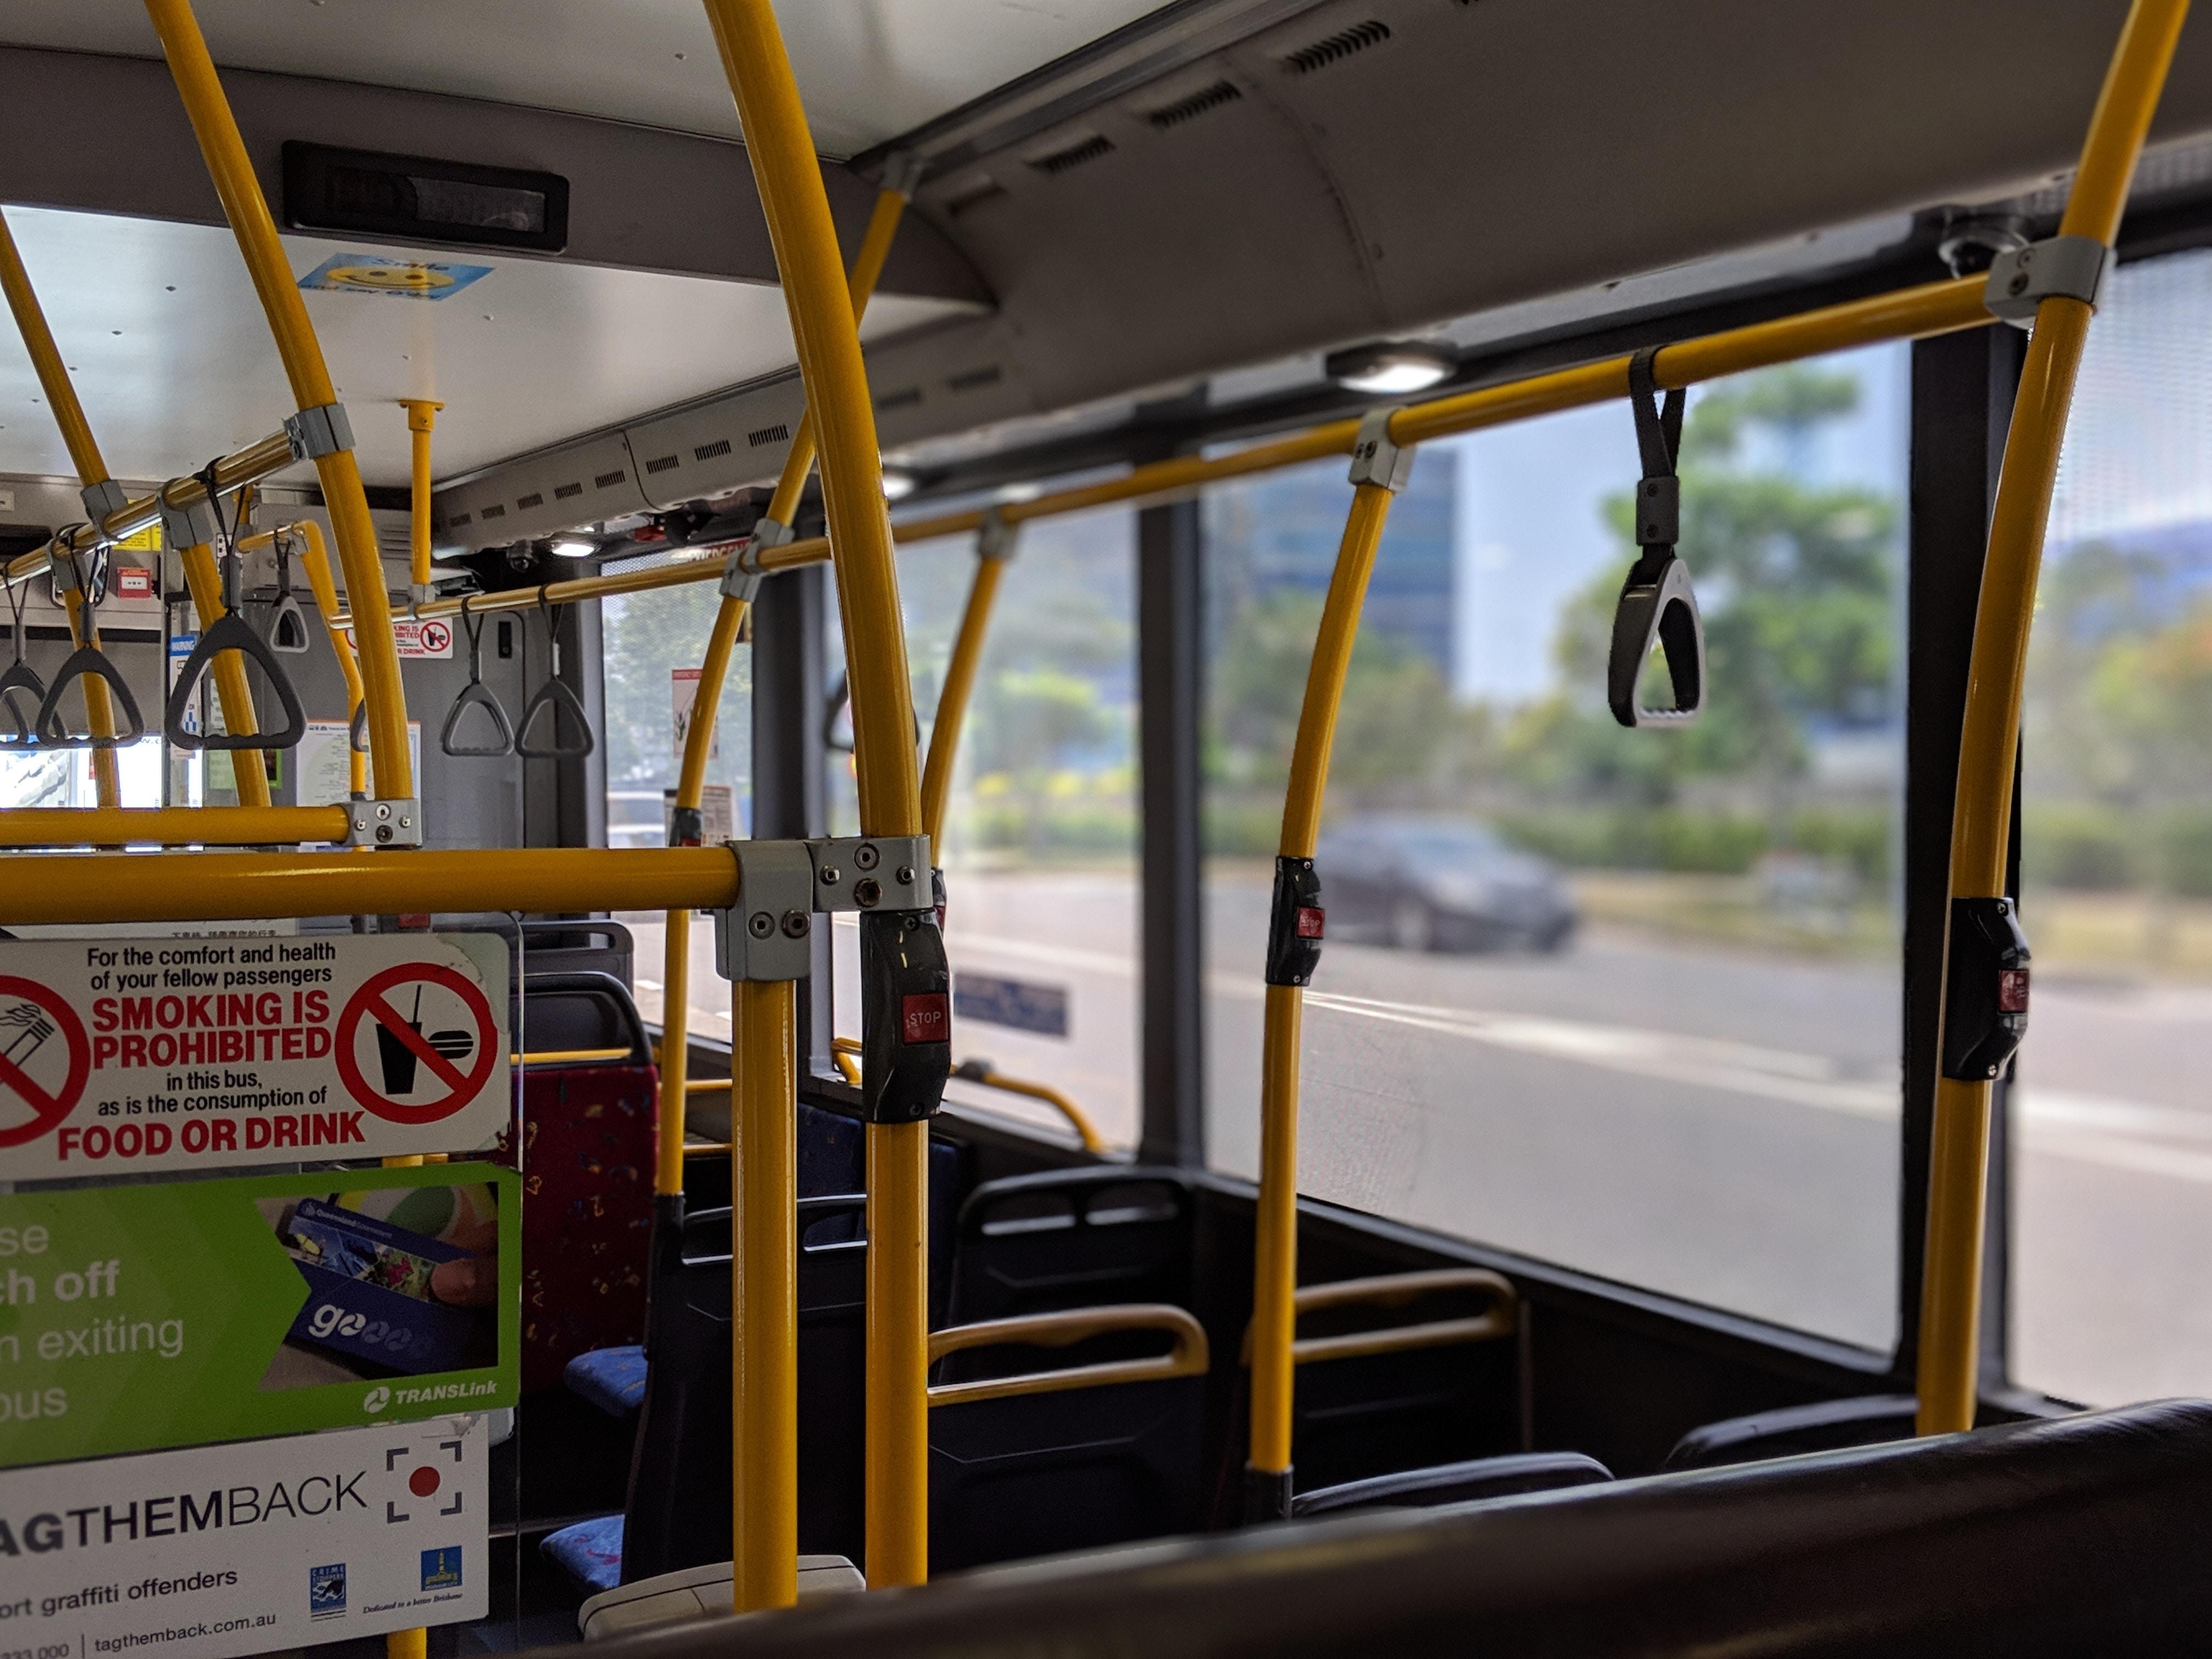 Inside a Brisbane Translink bus